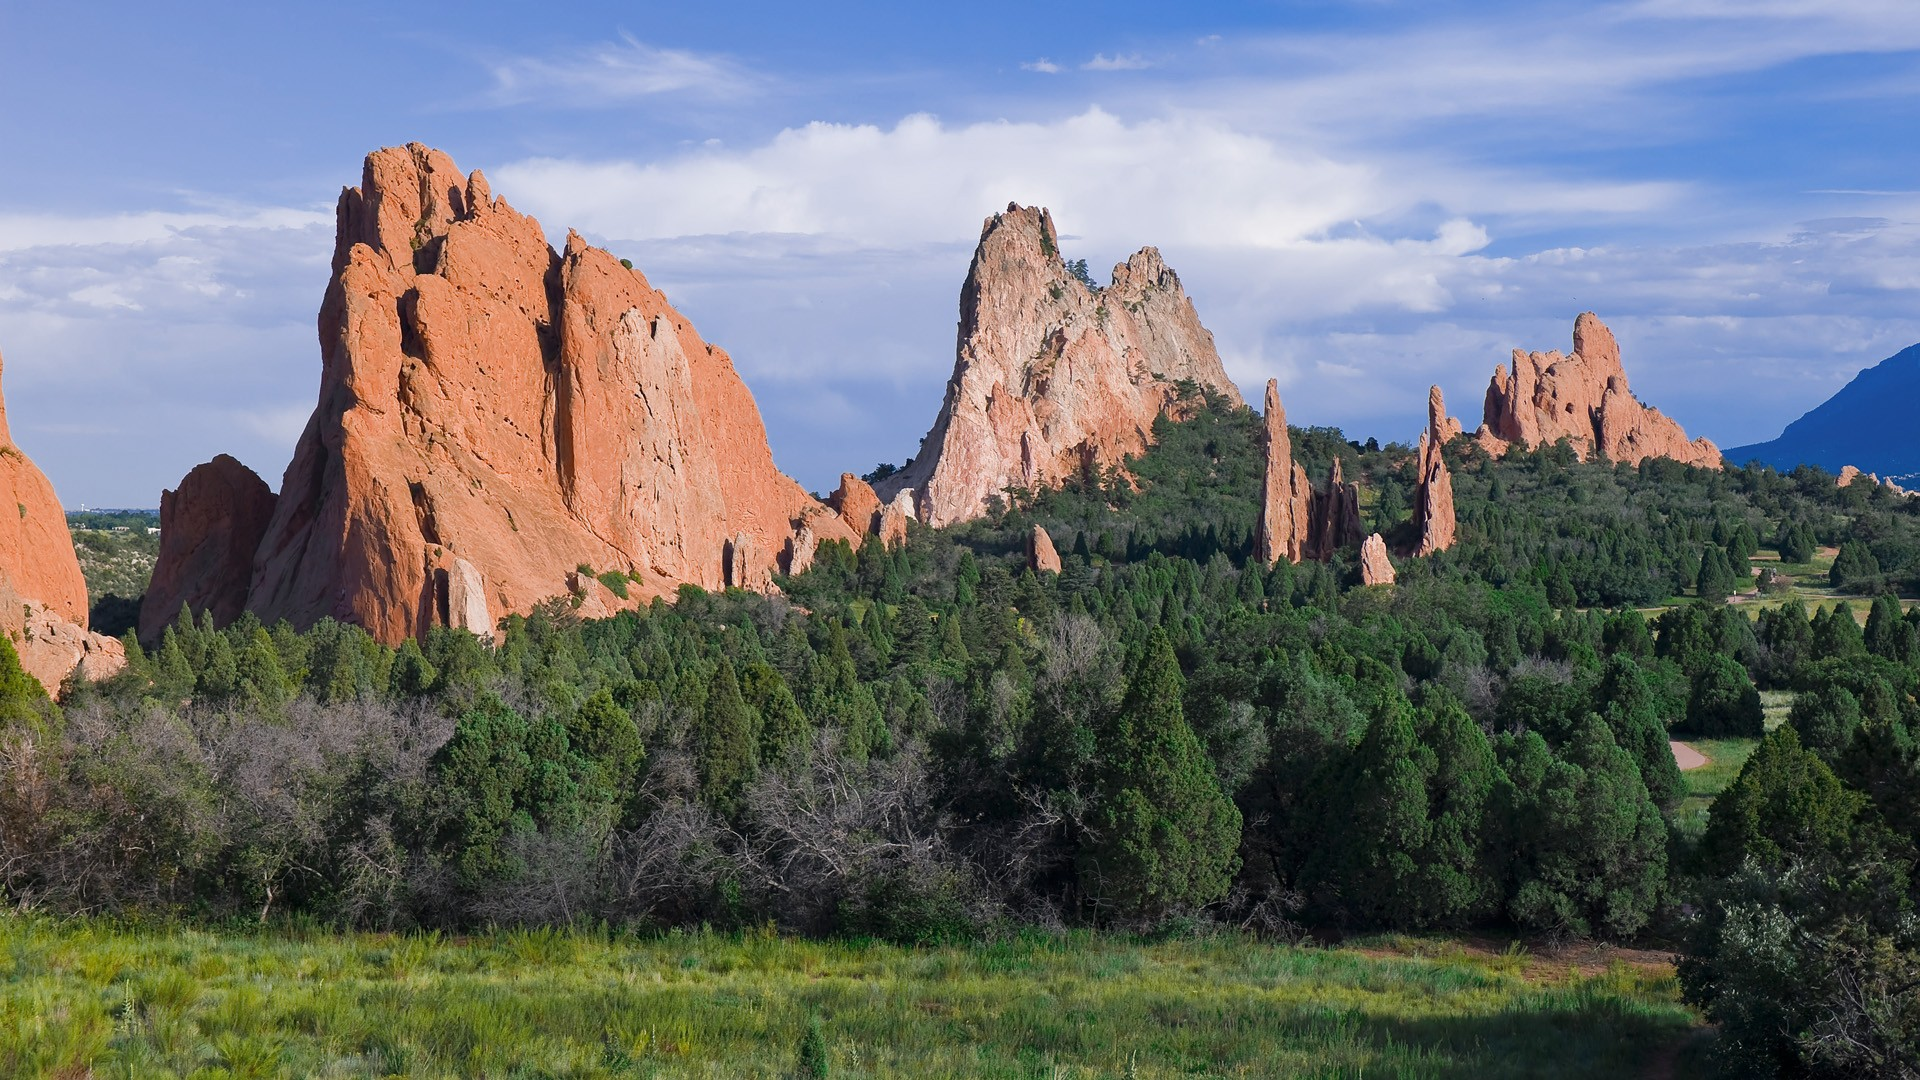 boulder colorado wallpaper 1080 - photo #28